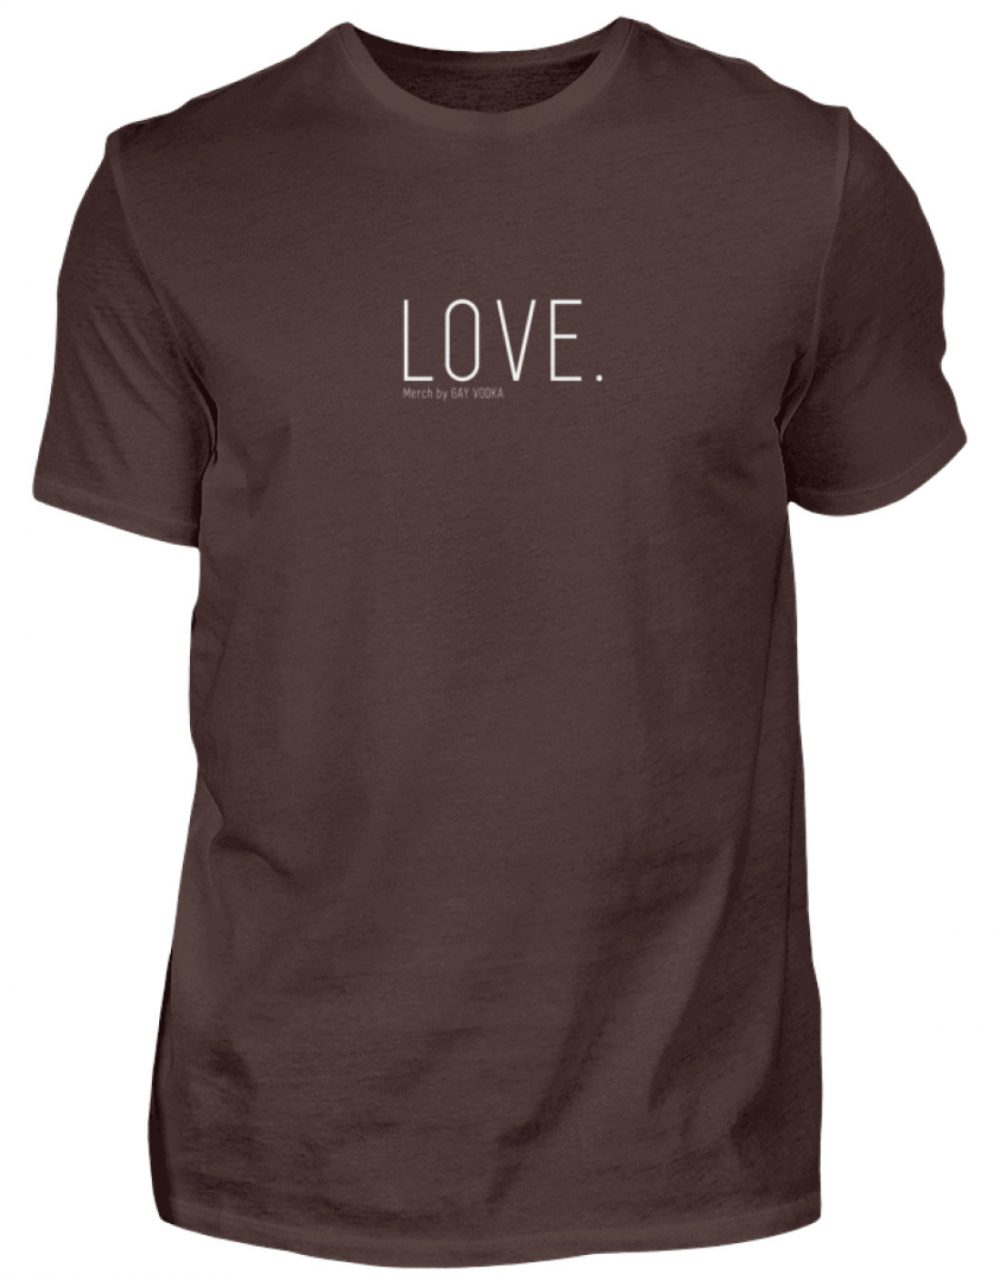 LOVE. - Herren Premiumshirt-1074